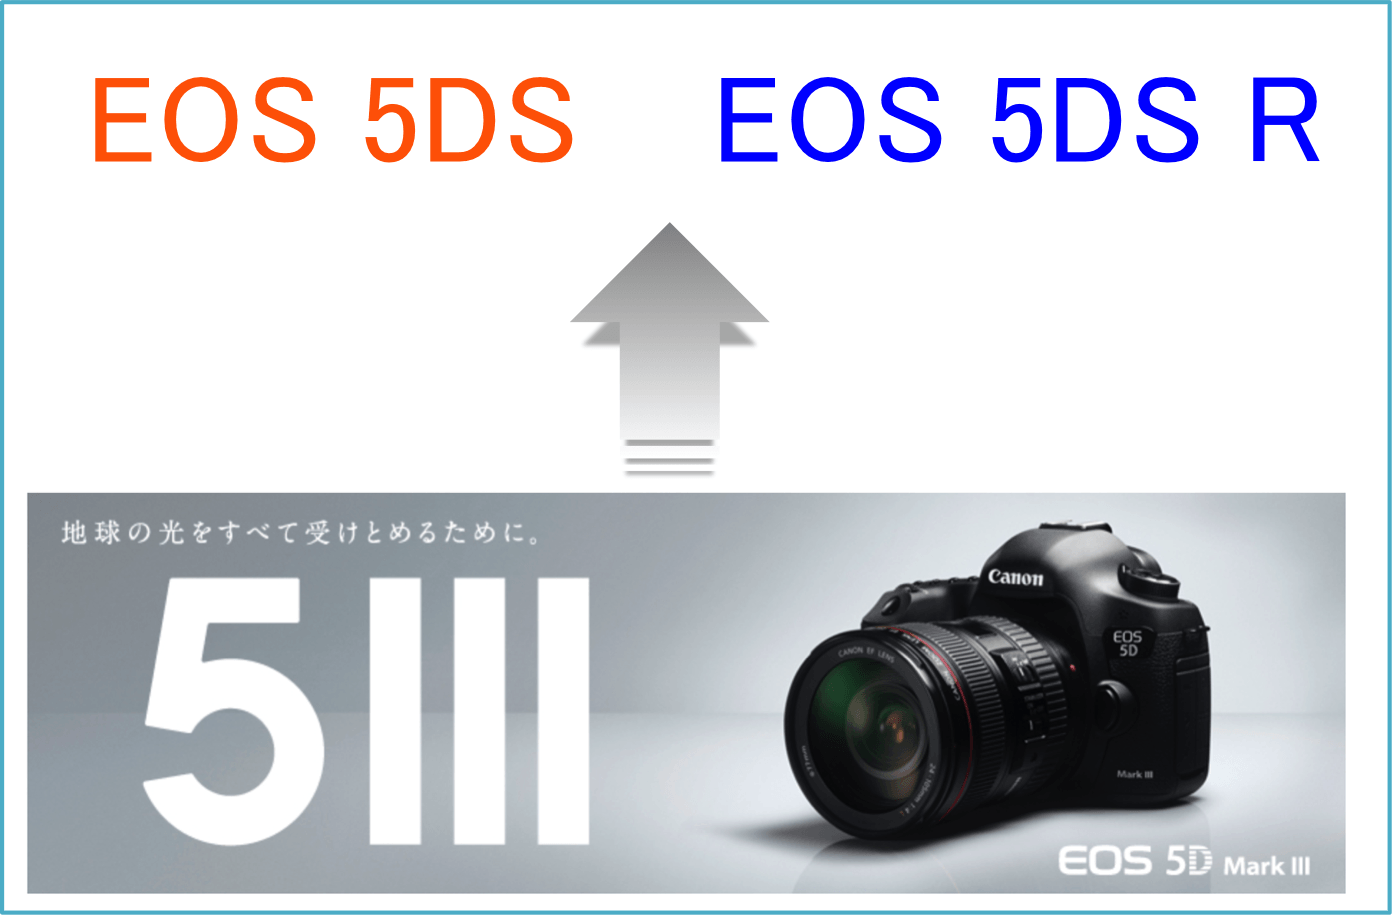 Canonが熱い!噂の新製品フルサイズカメラ(EOS 5DS, 5DS R)